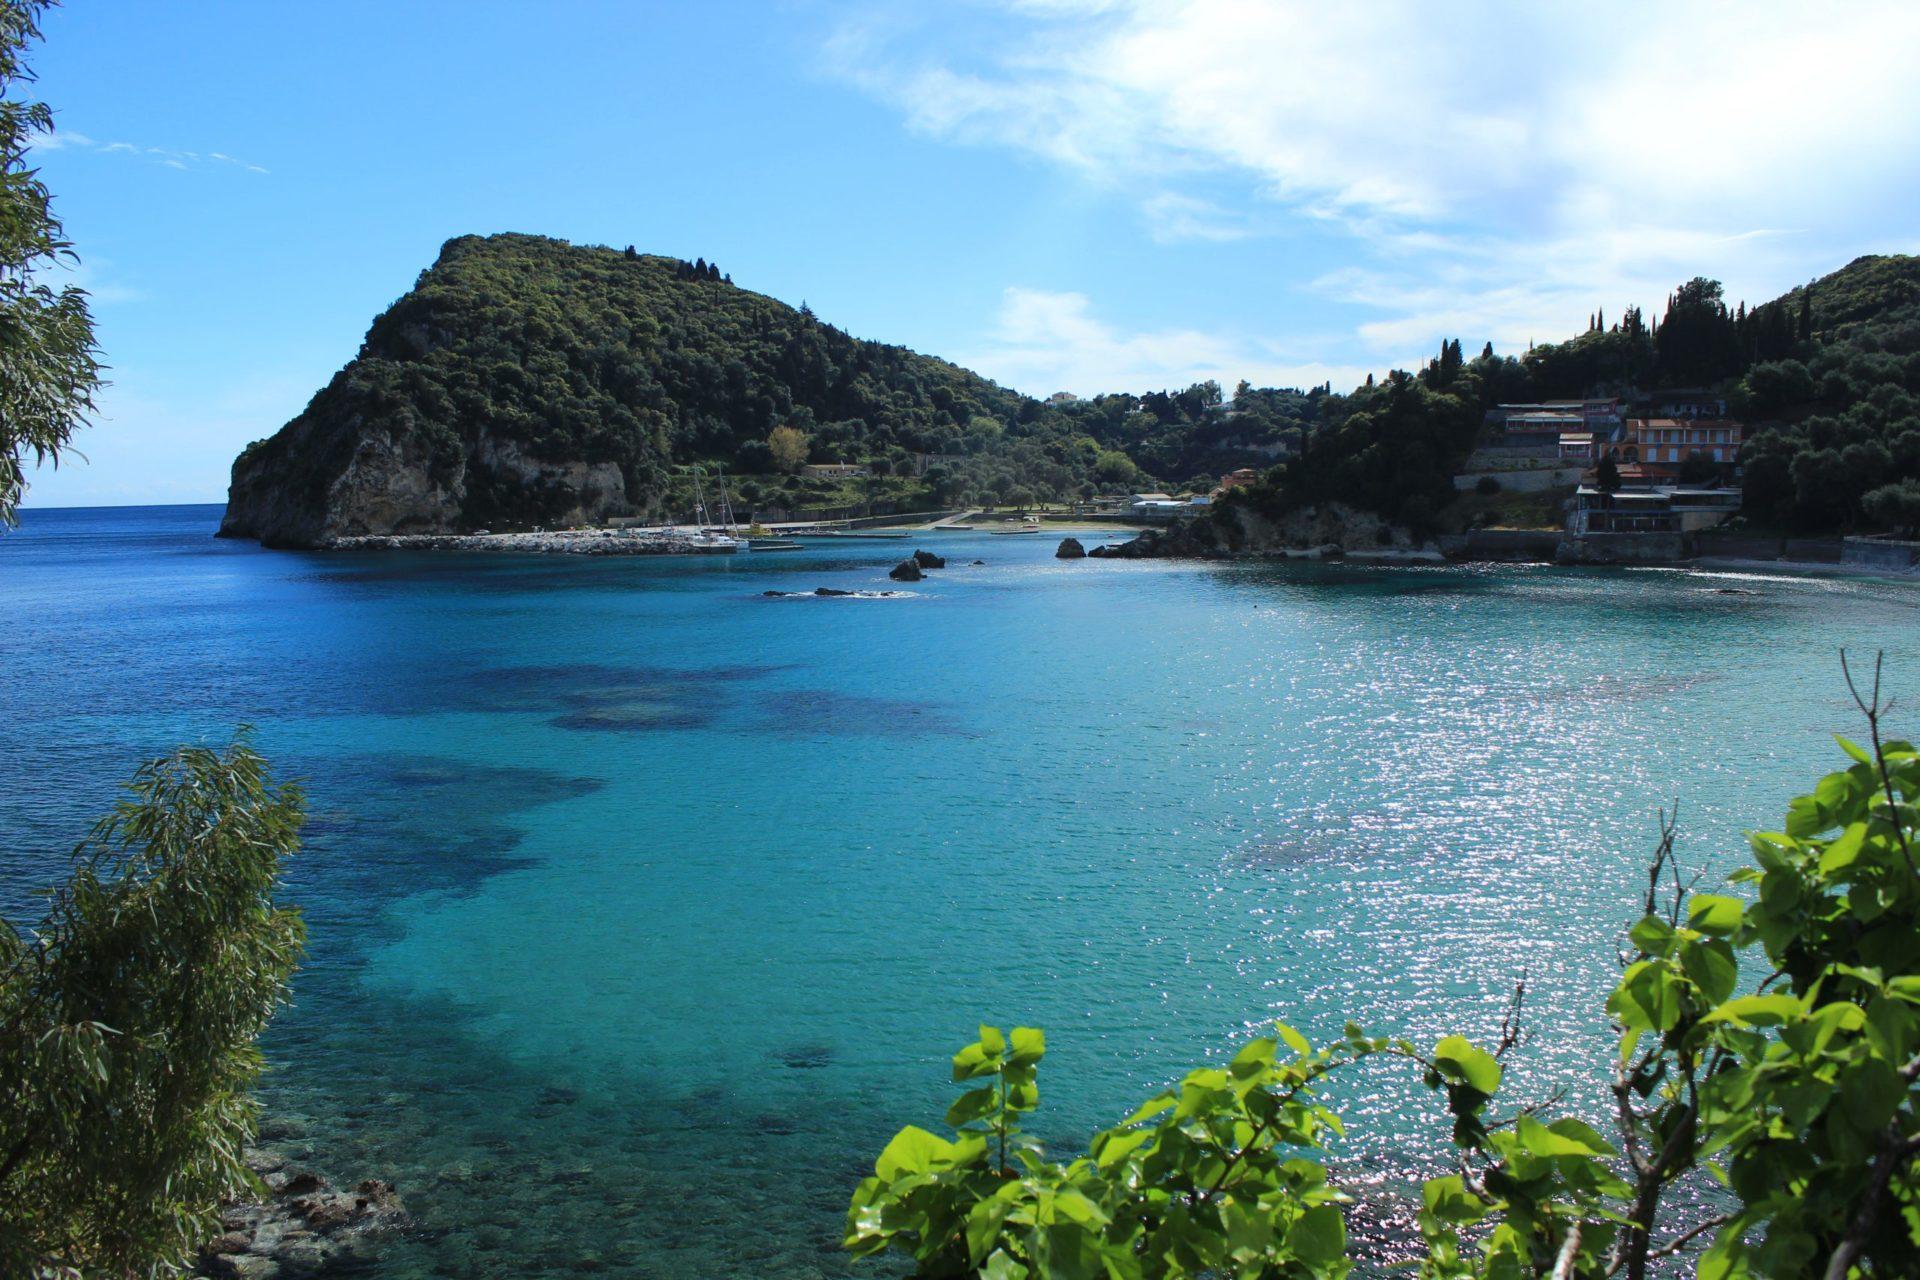 Wassertemperatur Korfu: Mittelmeer bei Paleokastritsa